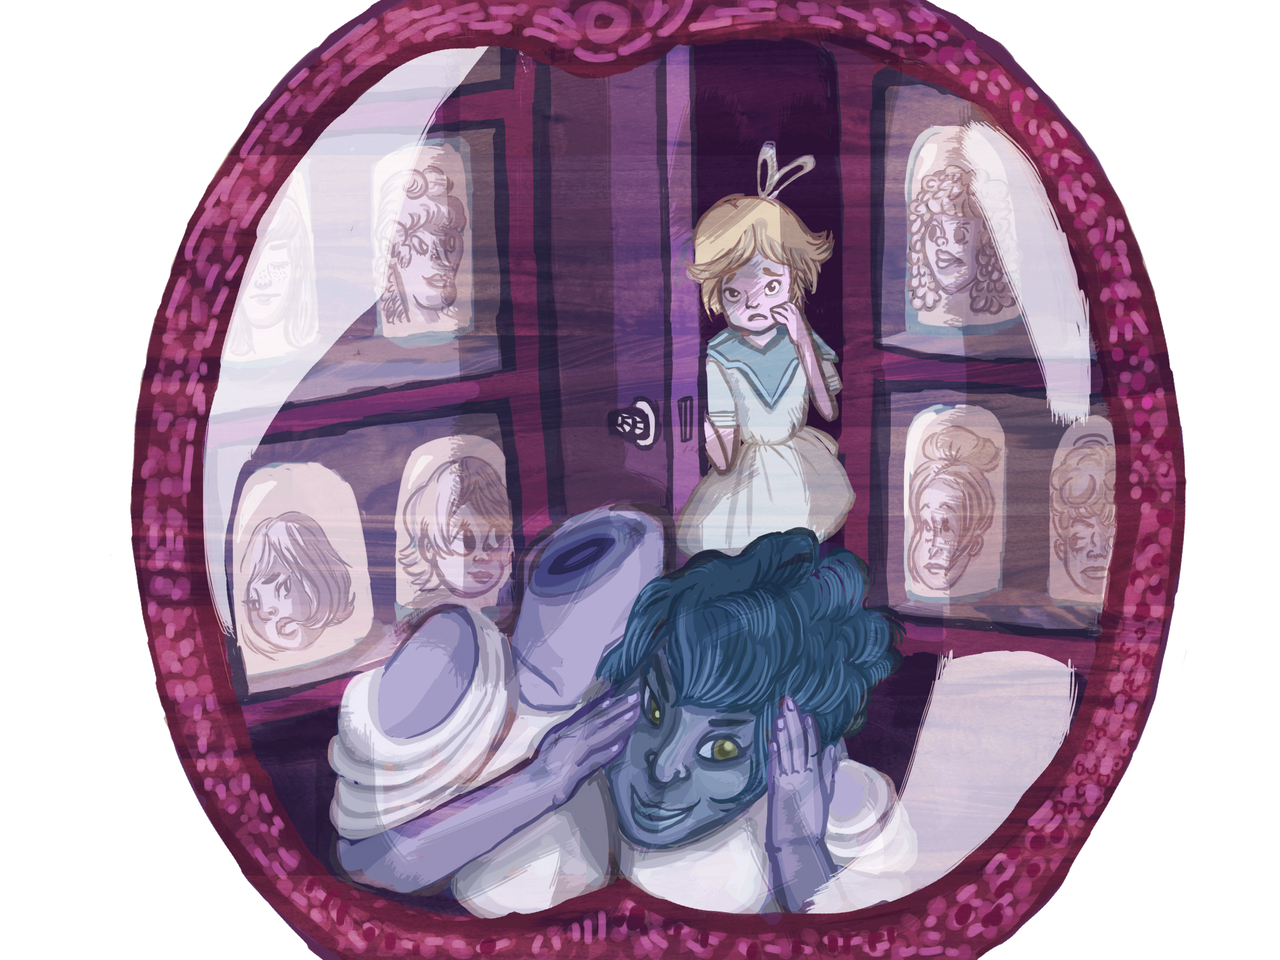 Langwidere's Heads by Einde